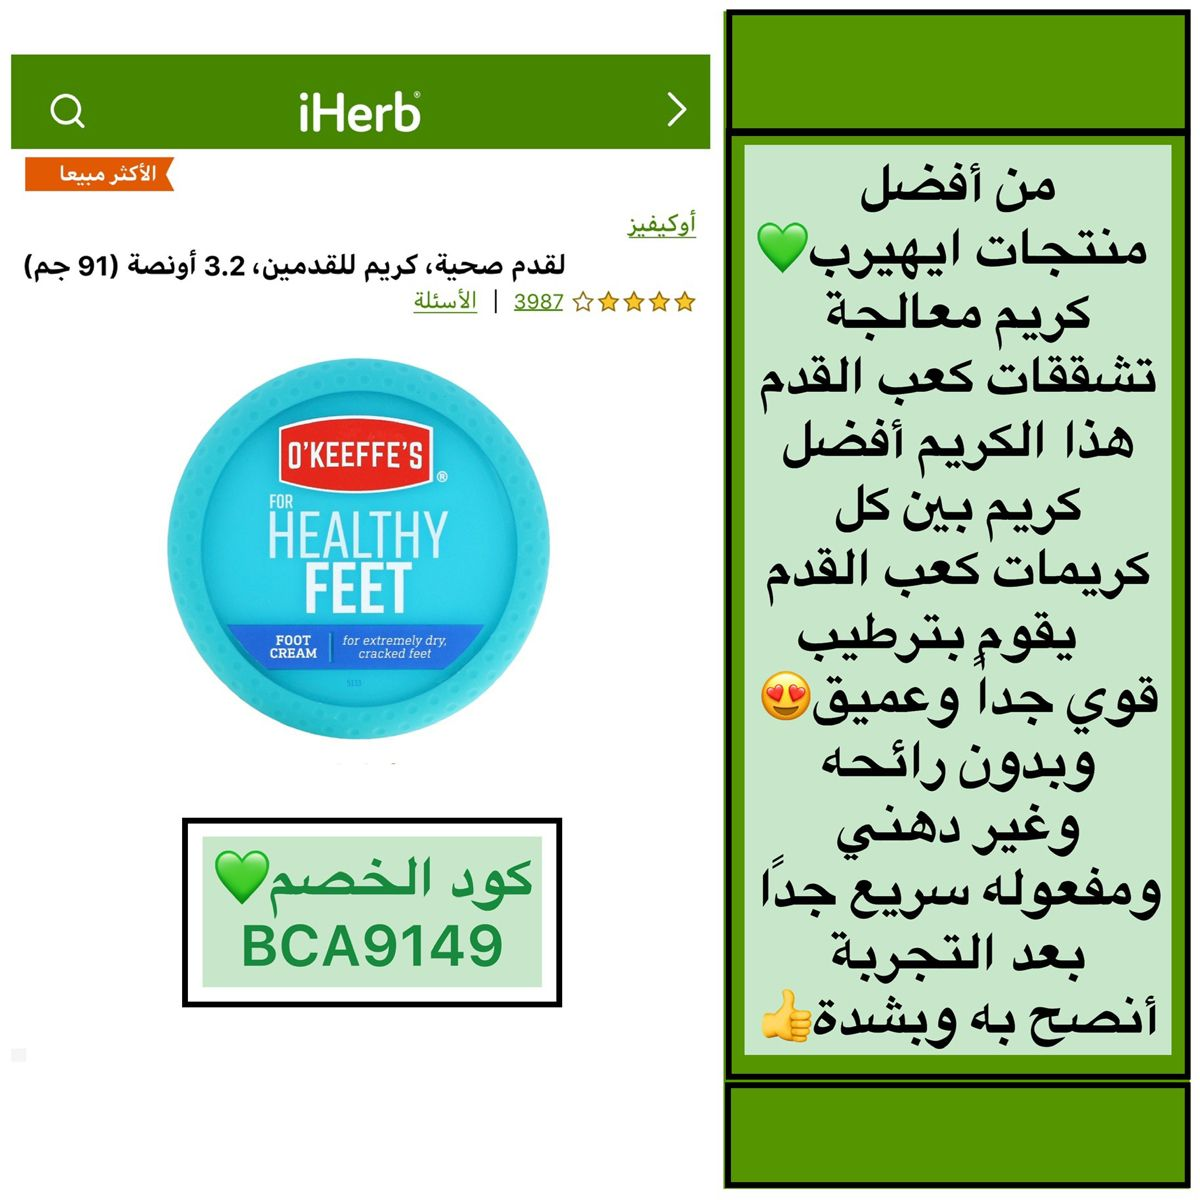 O Keeffe S لقدم صحية كريم للقدمين 3 2 أونصة 91 جم Foot Cream Cream Iherb